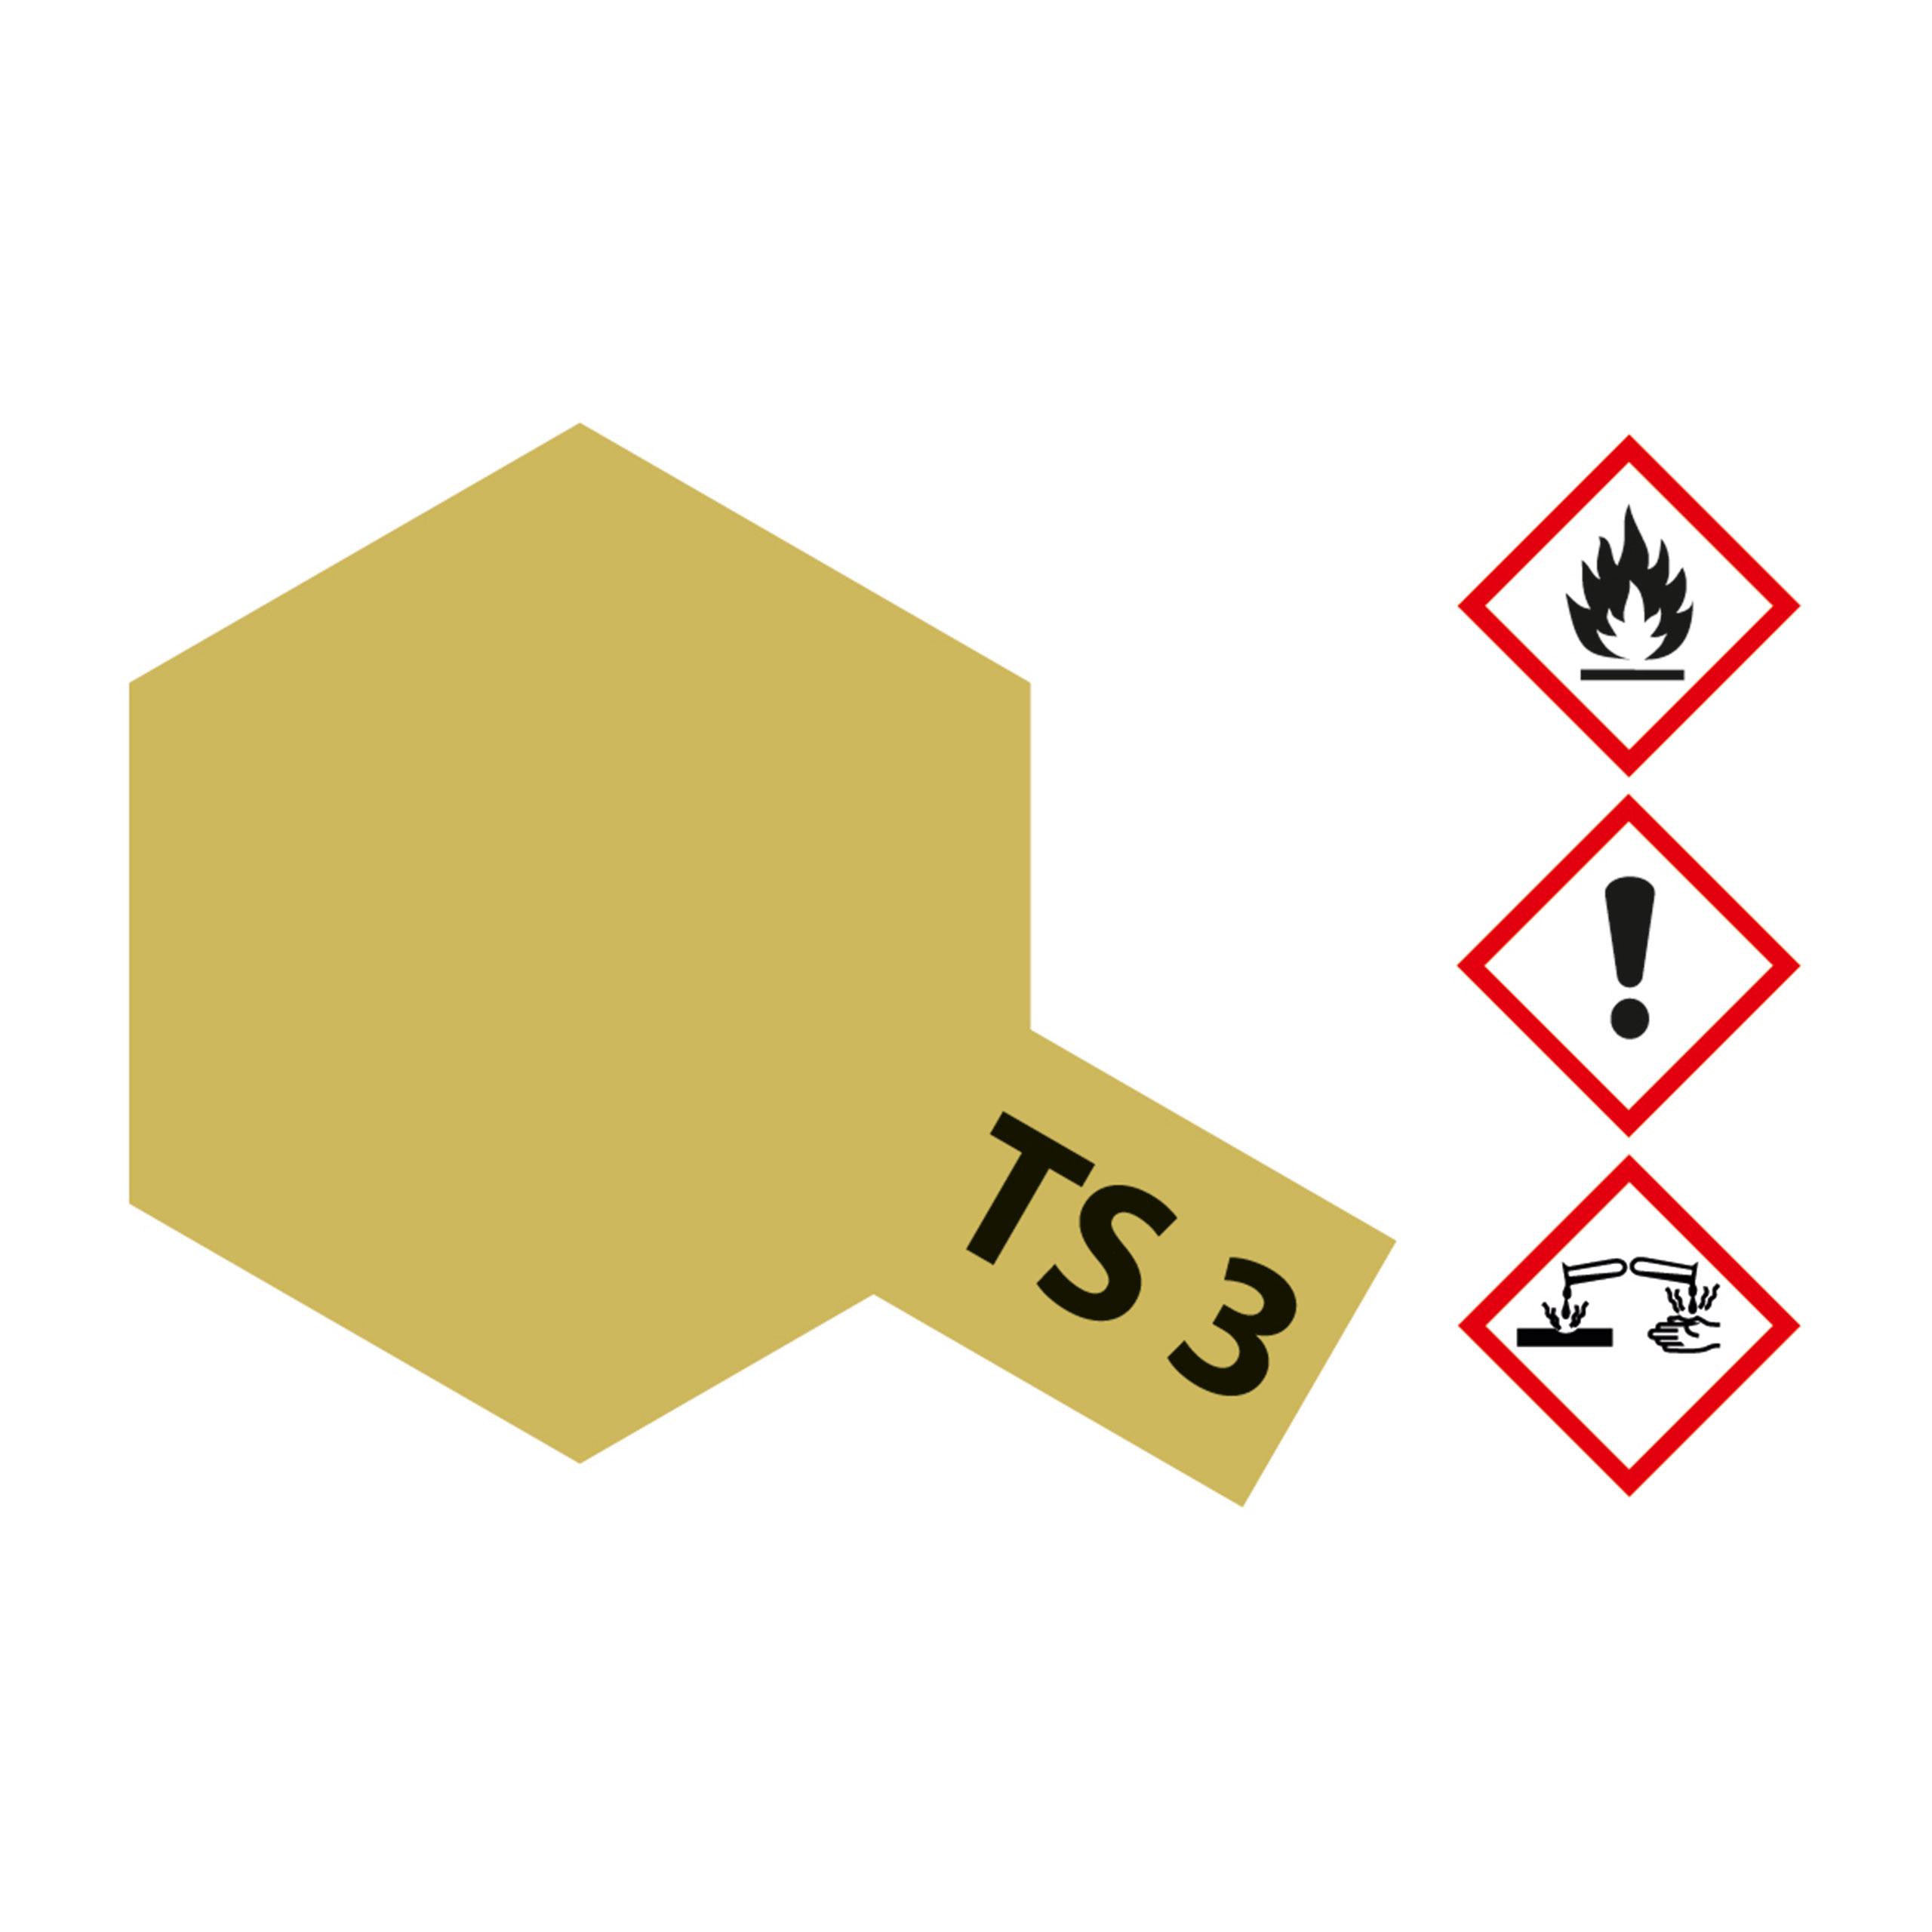 TS-3 Dunkelgelb matt - 100ml Sprayfarbe Kunstharz Tamiya 300085003